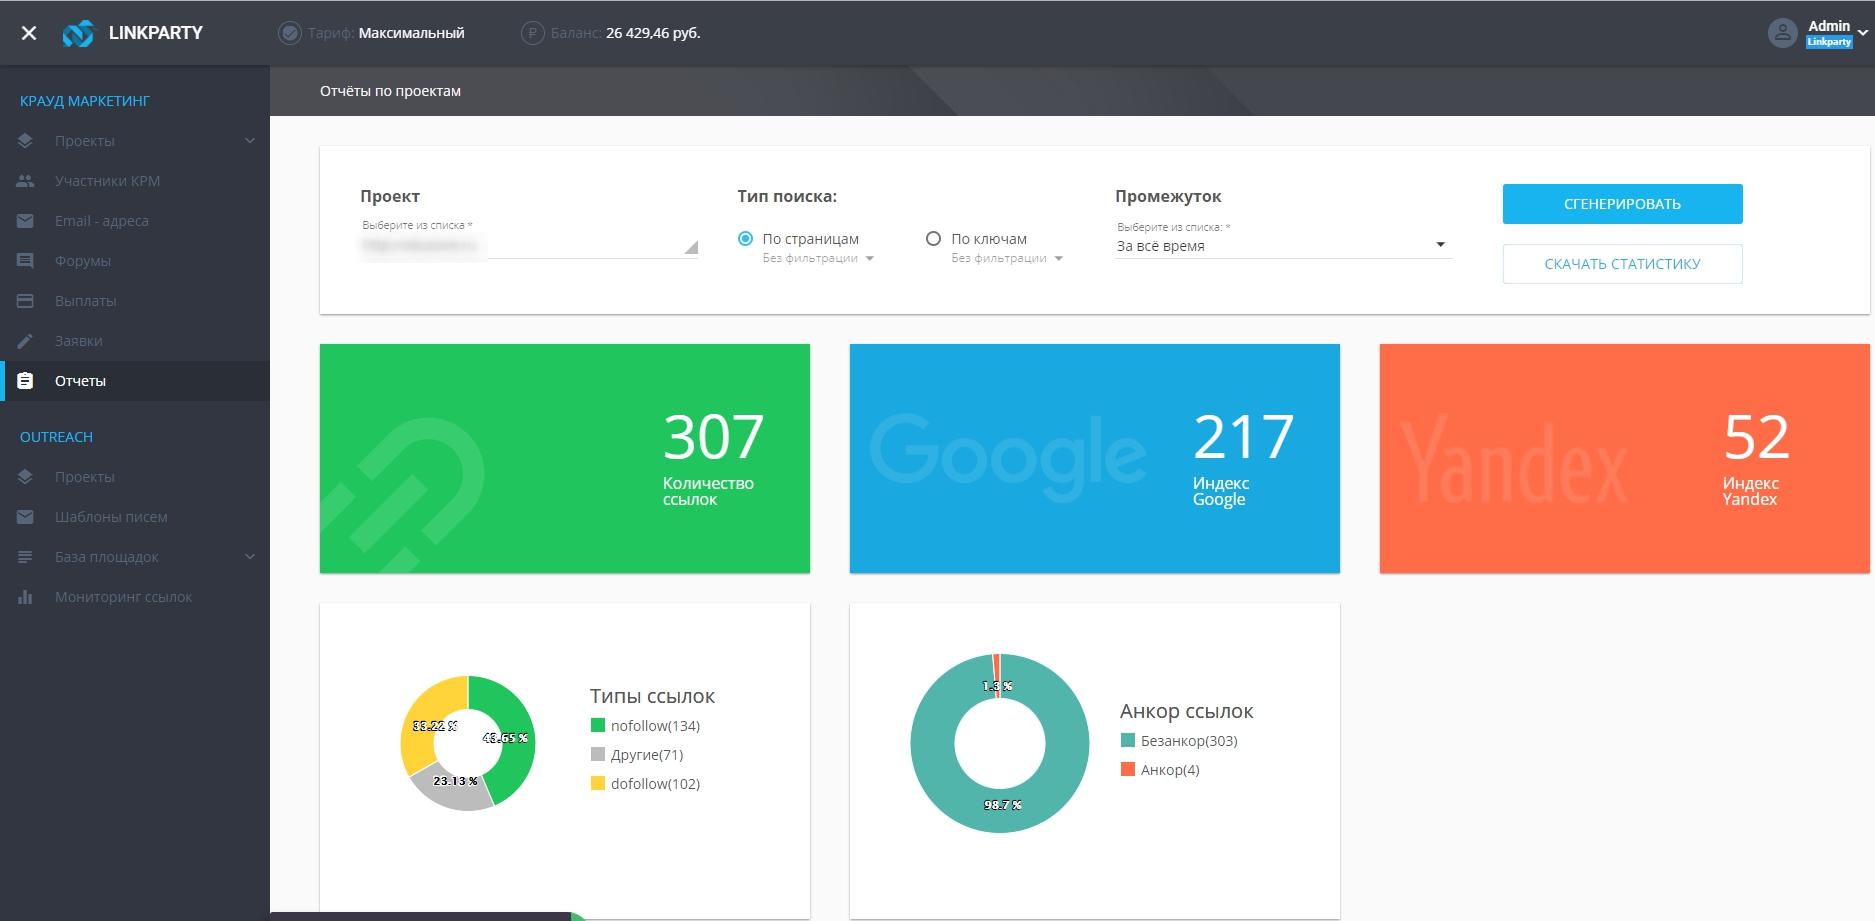 Отчеты по проектам в сервисе LinkParty